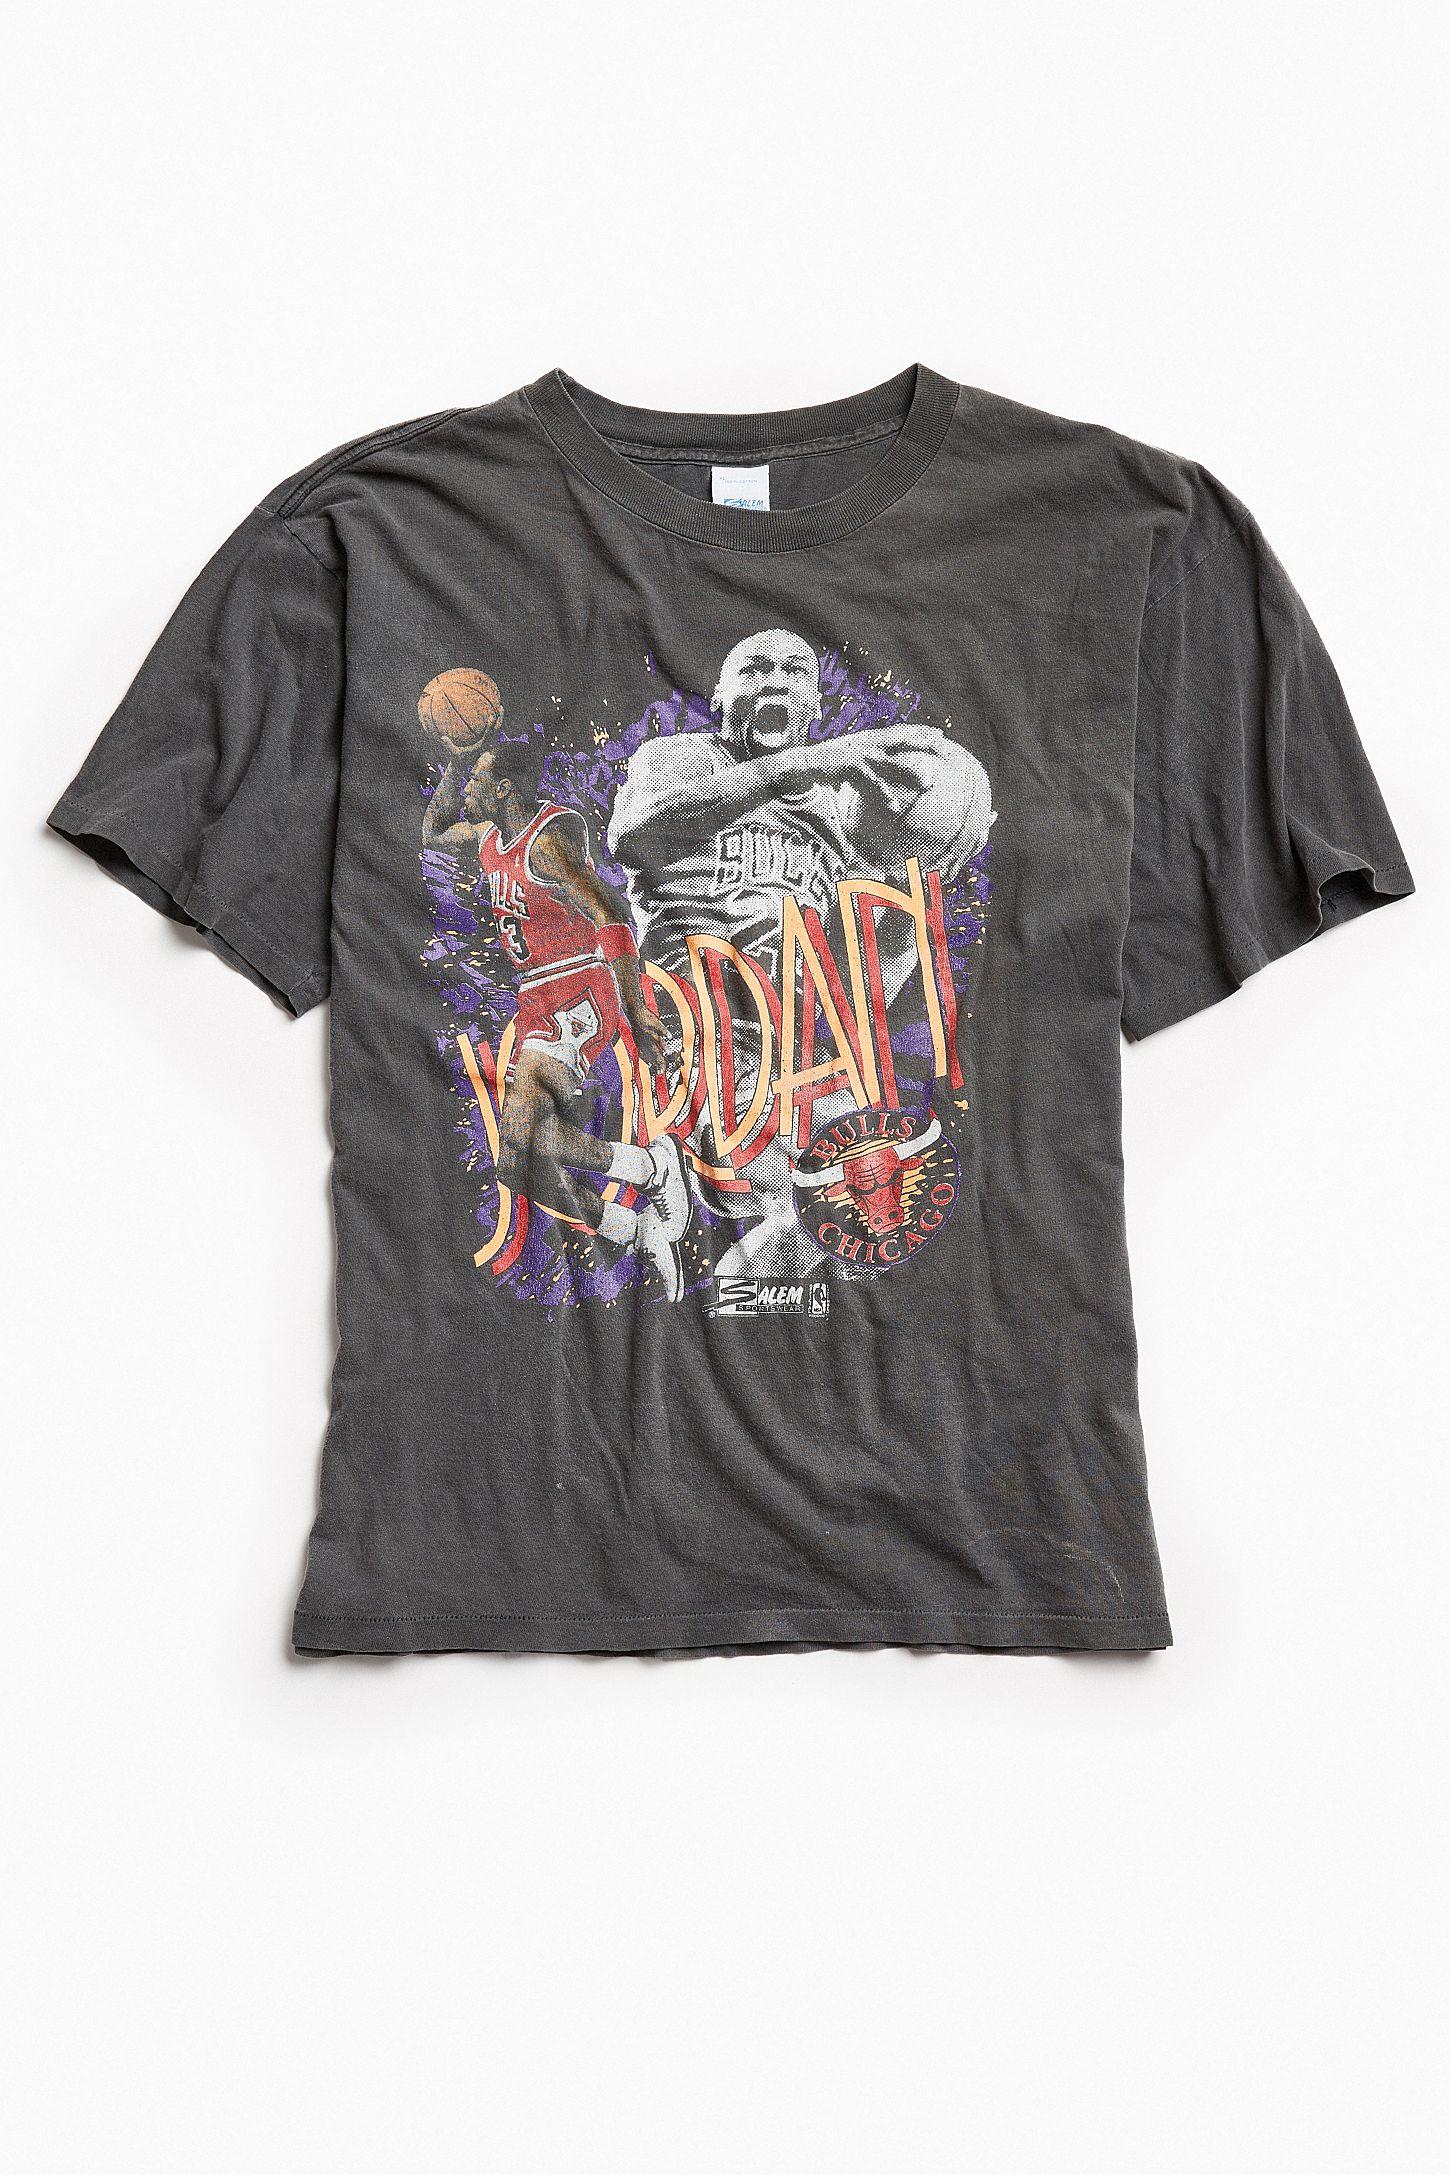 7304e7370d87 Vintage NBA Michael Jordan Chicago Bulls Tee